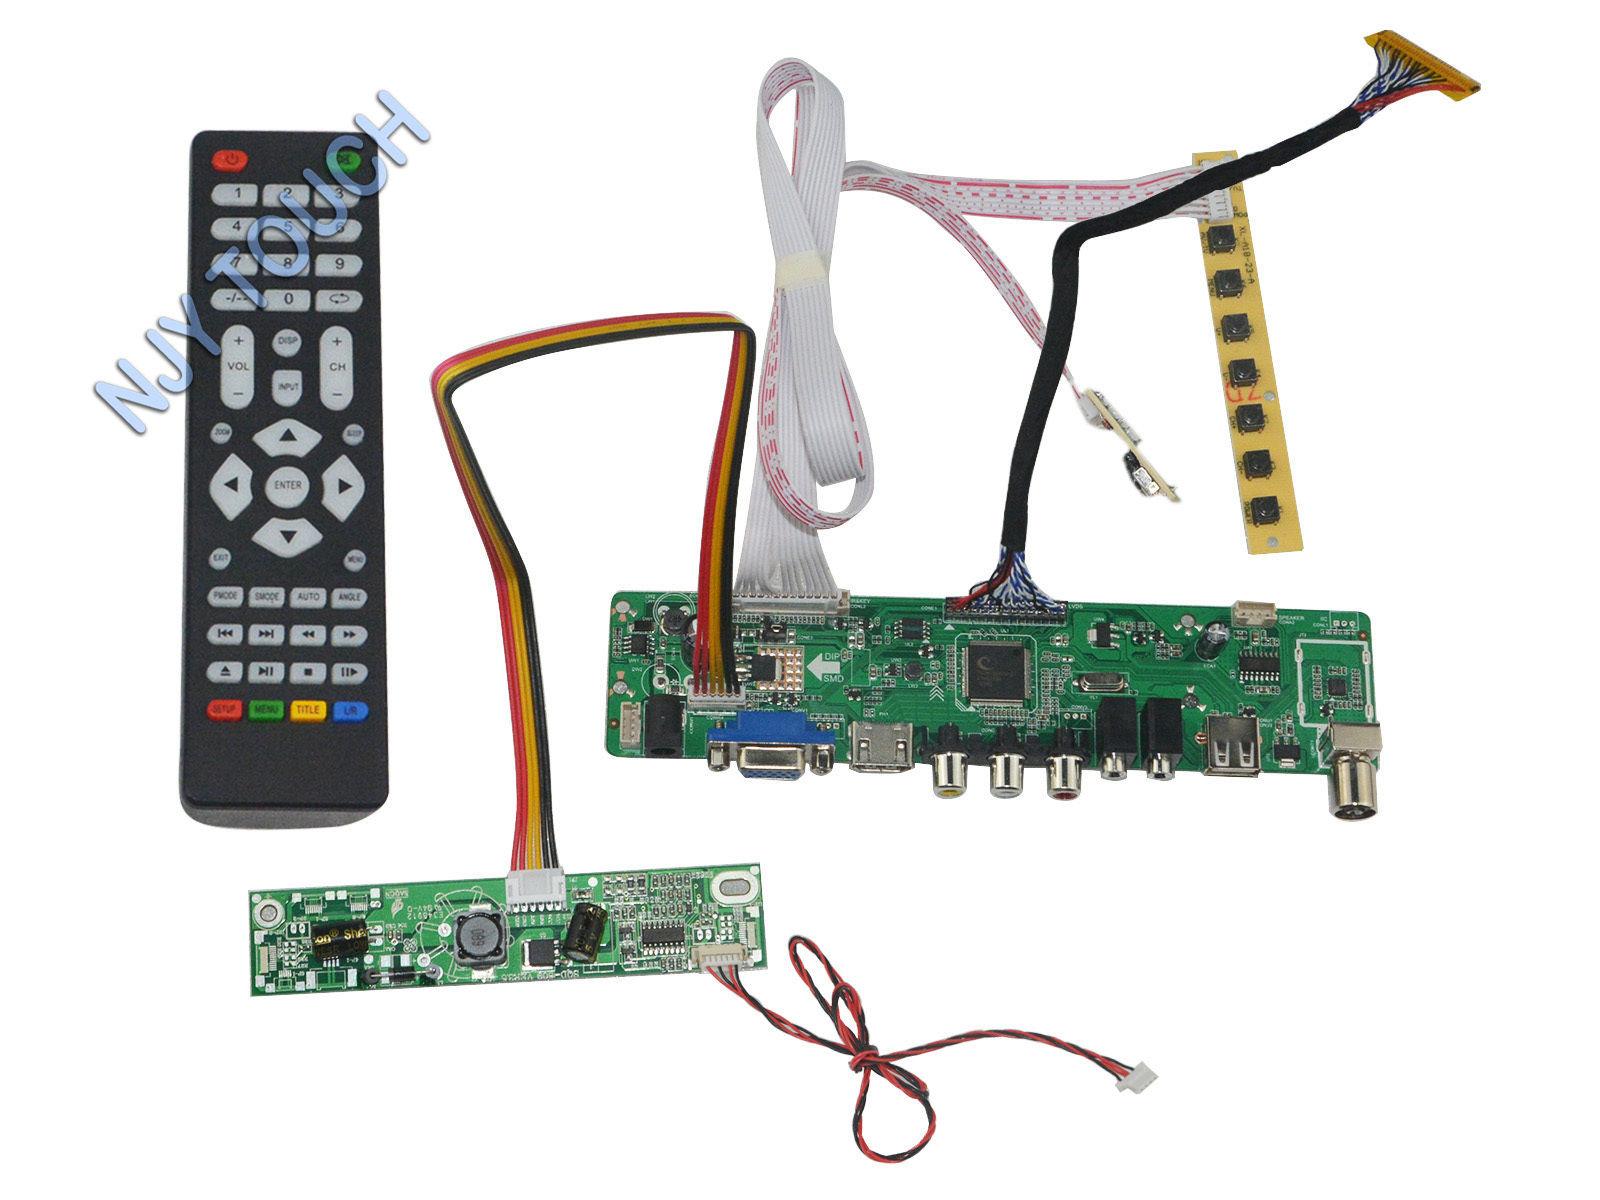 Hd Mi Usb Atv Lcd Controller Board For Ltm200kt10 Ltm200kt12 1600x900 4pin  - Buy Atv Lcd Controller Board,Hdmi Lcd Controller Board,Hdmi Usb Lcd